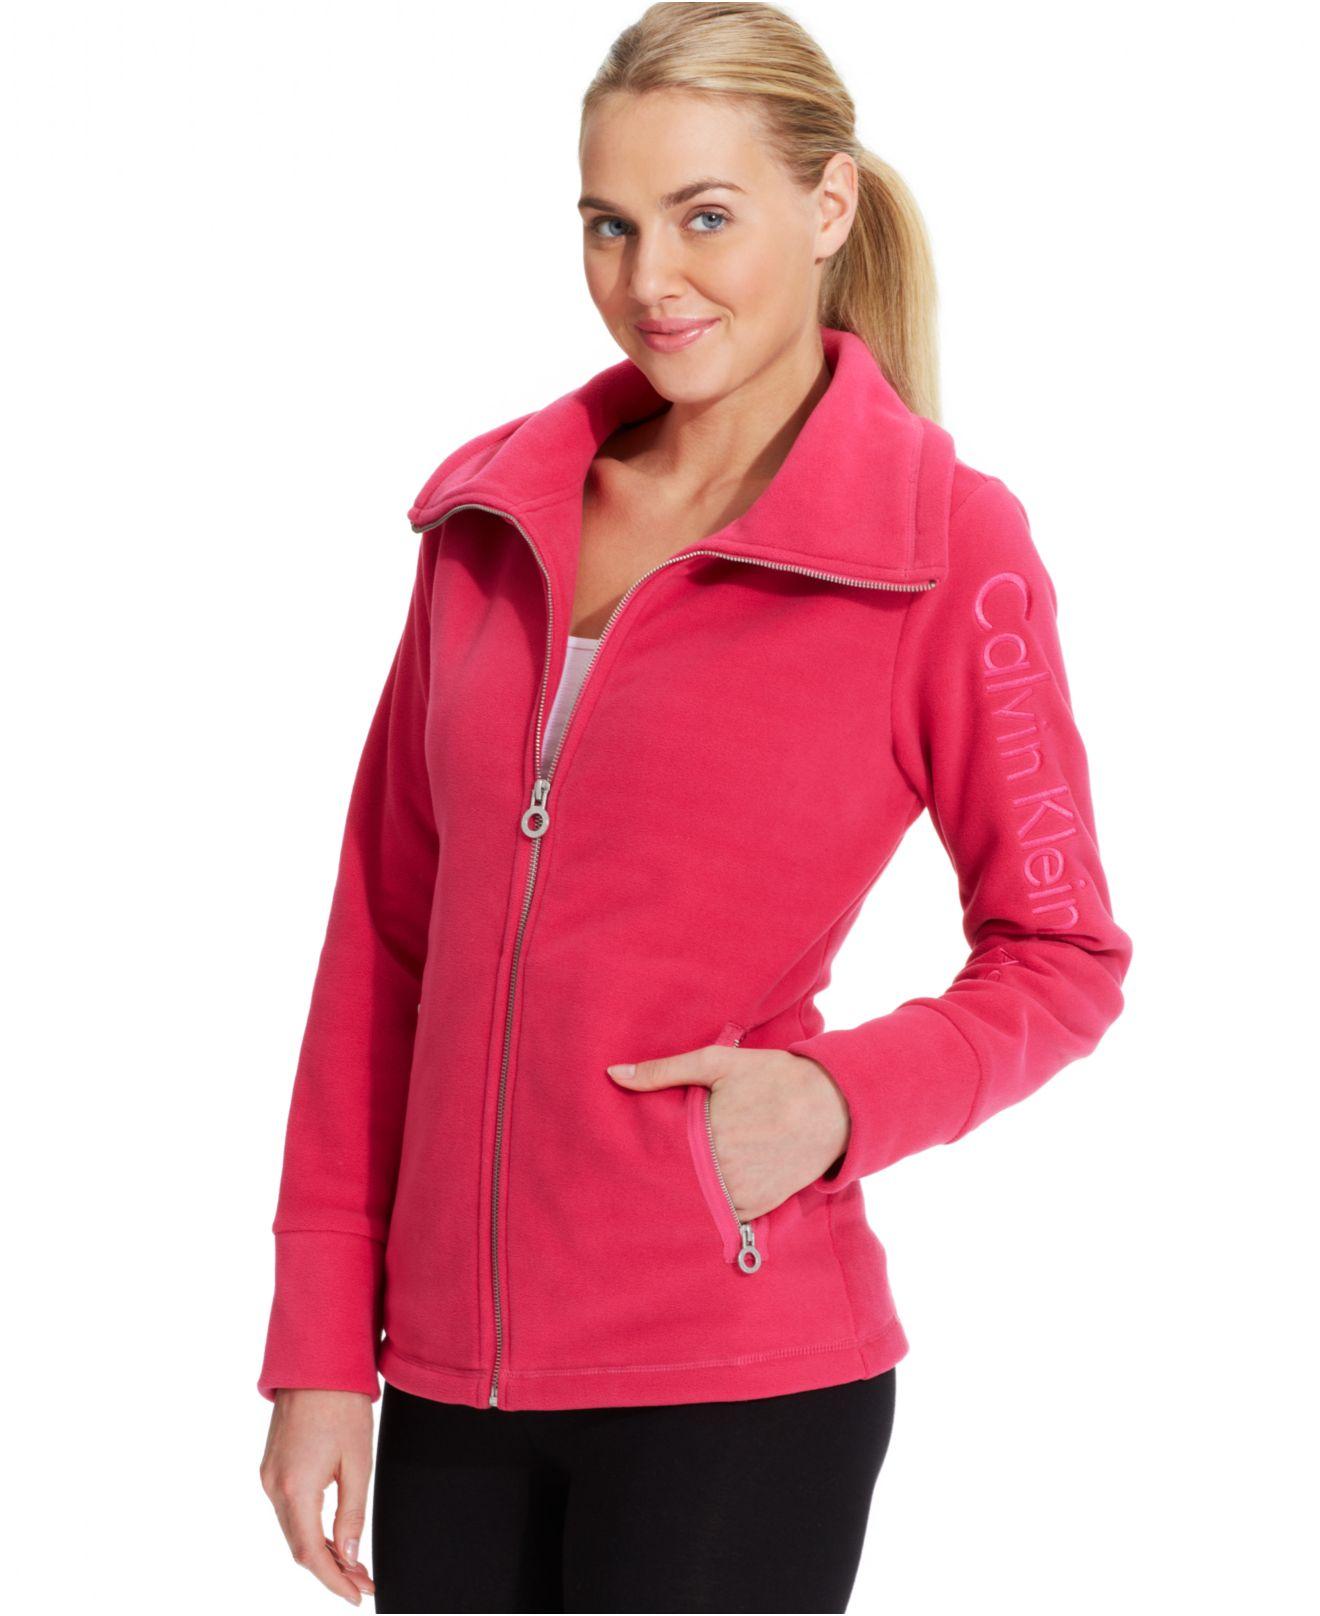 Calvin klein Performance Fleece Logo Jacket in Red | Lyst